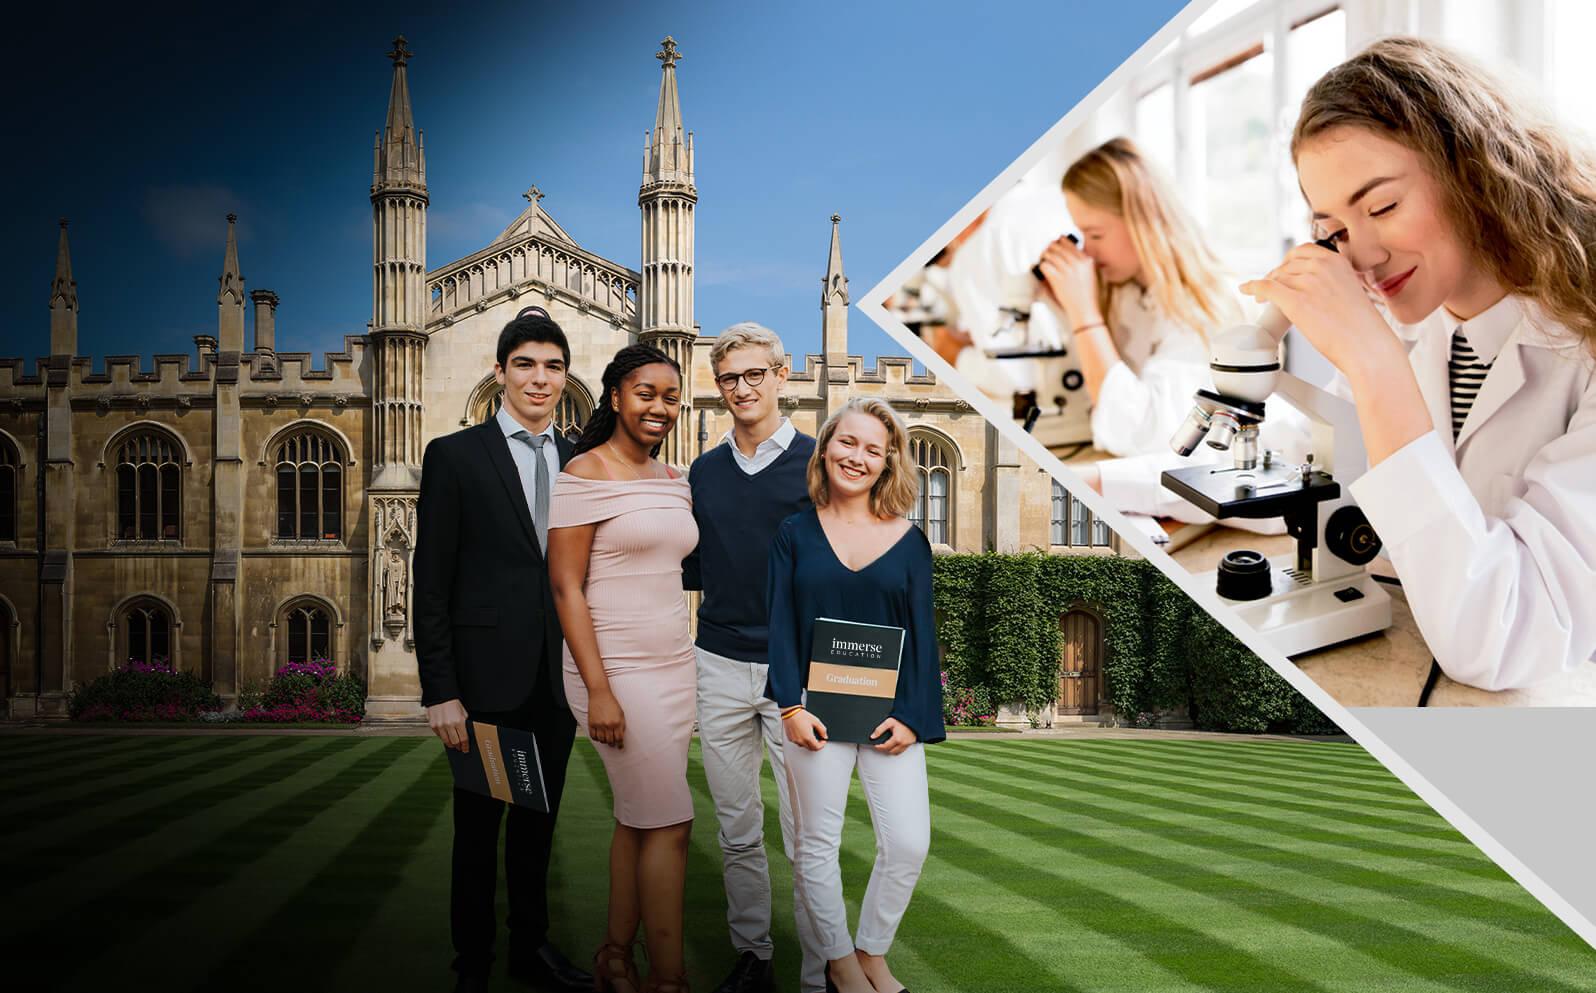 Cambridge Chemistry Summer Program for Ages 16-18